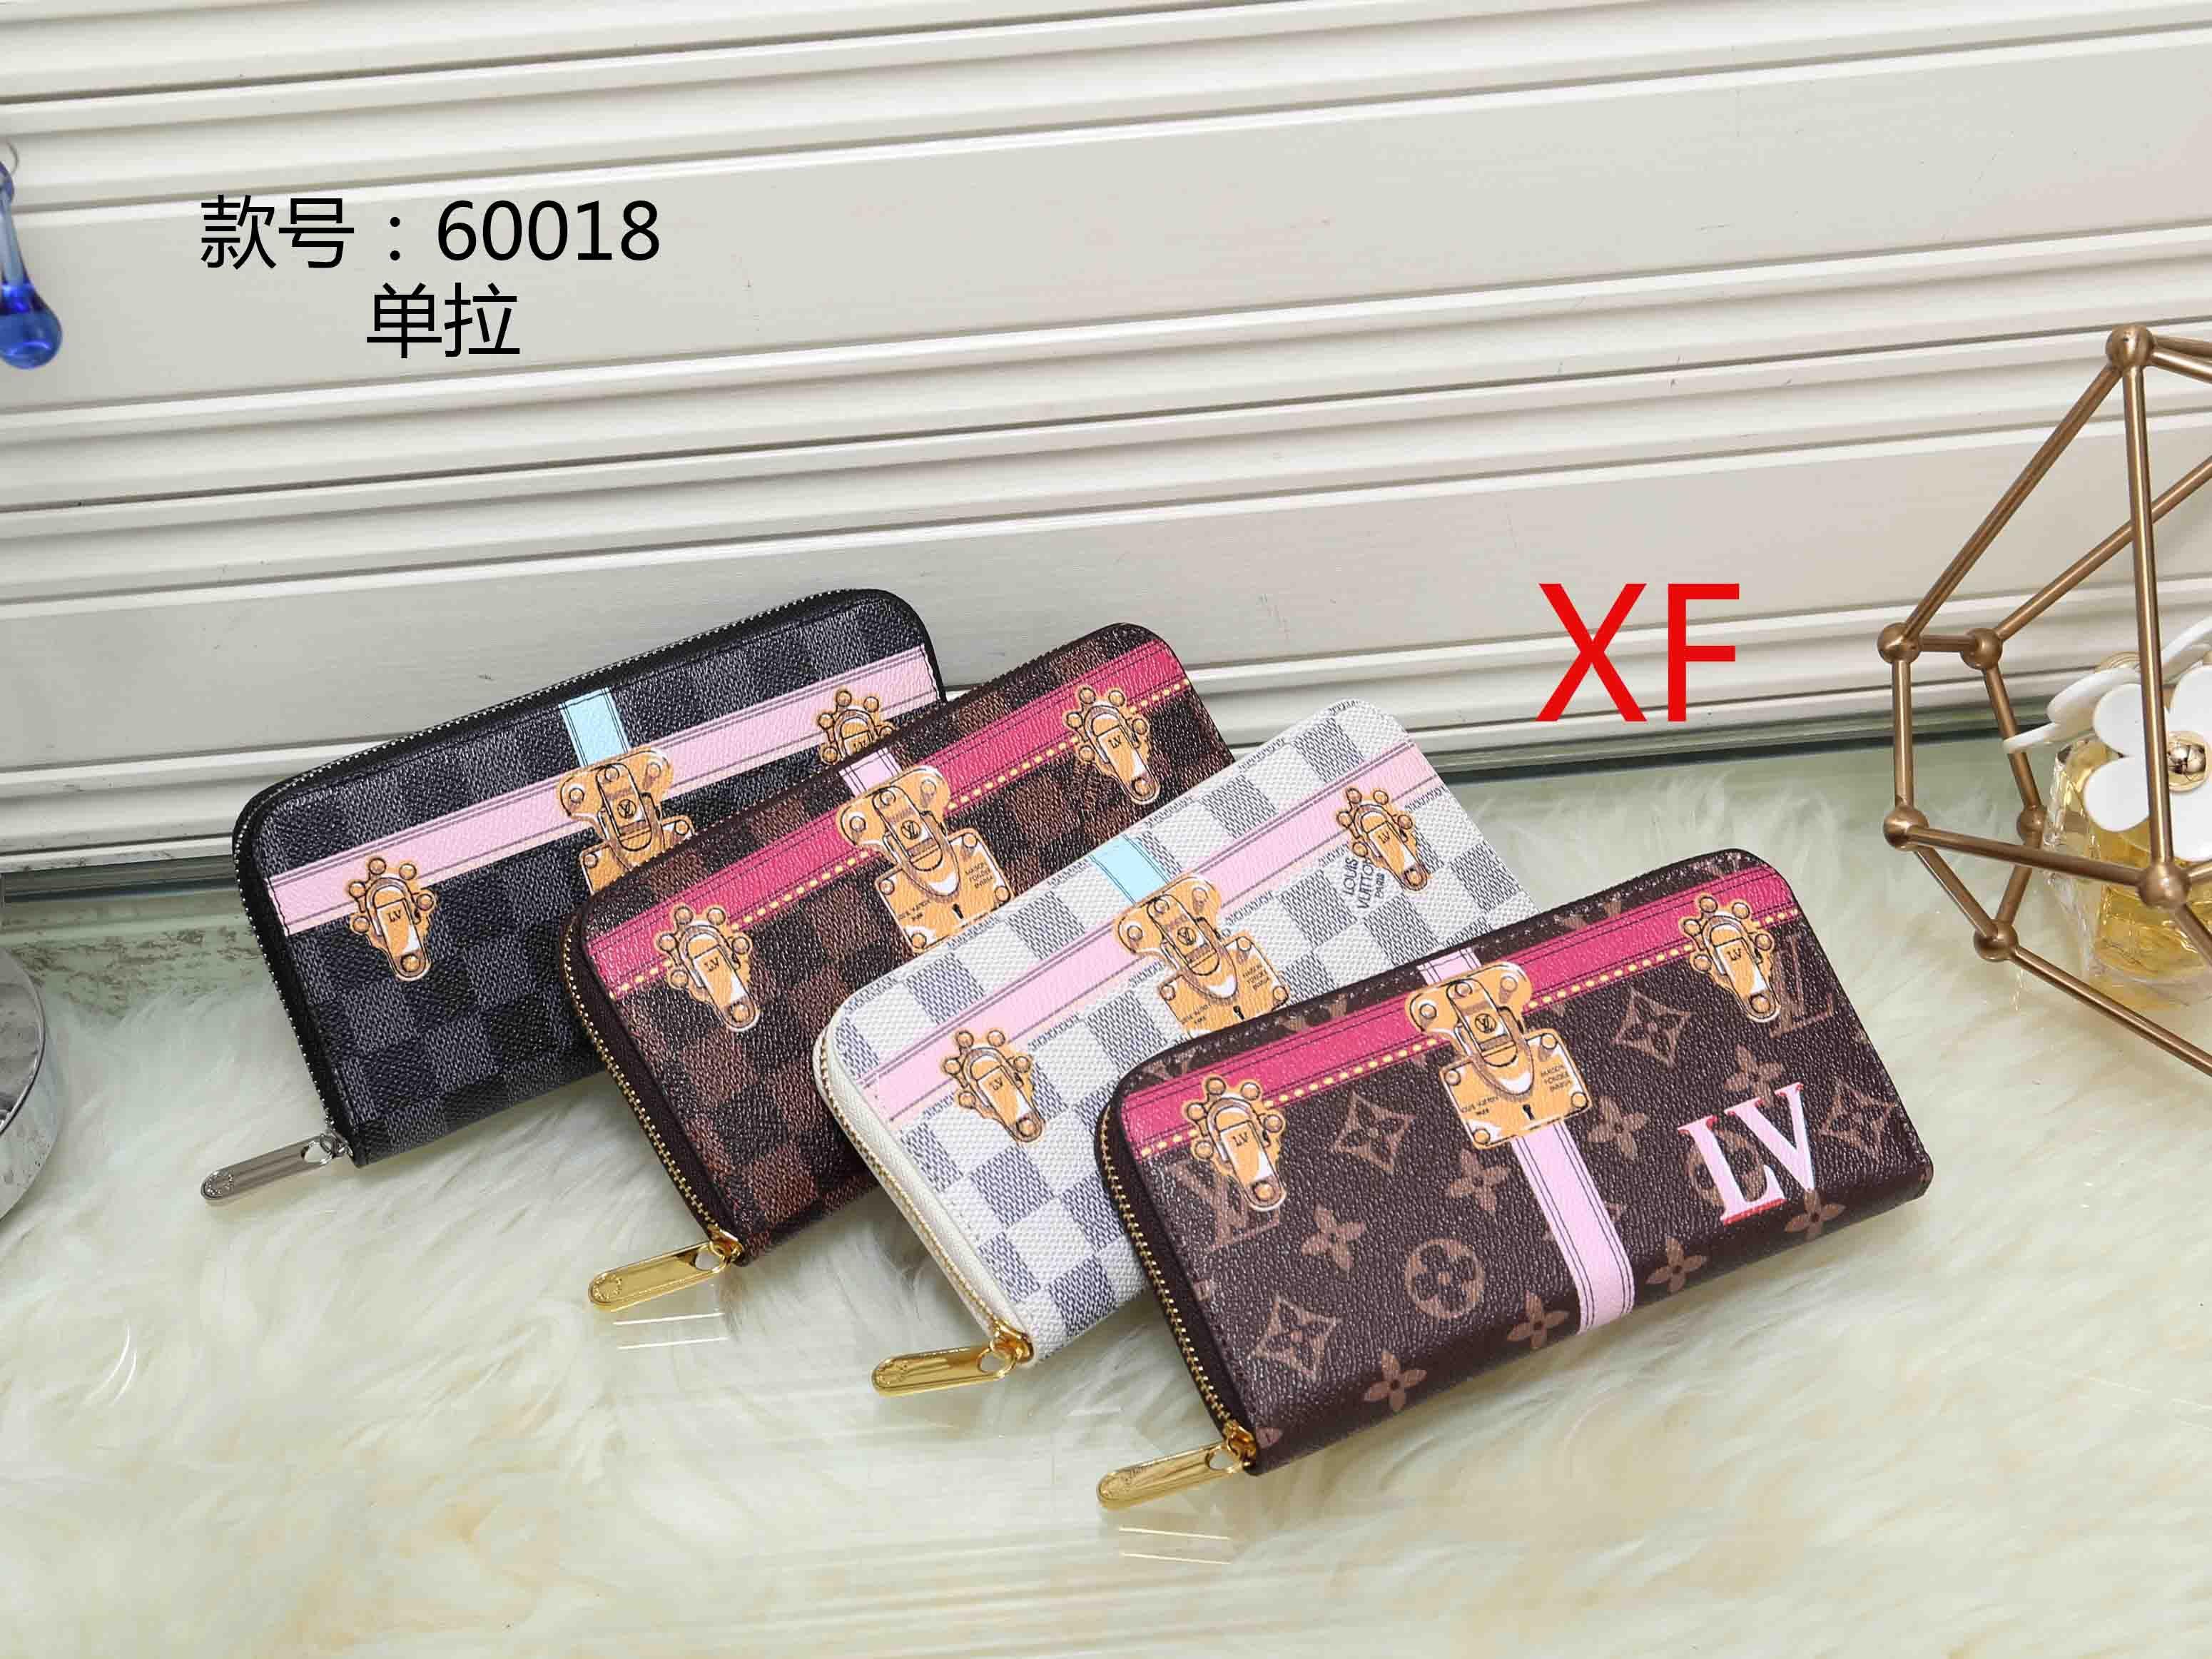 89bc445f5f83 Fashion Designer Clutch Genuine Leather Wallet with Dust Bag 60018 Bags  Handbags Designer Handbags Designer Online with  17.97 Piece on ...